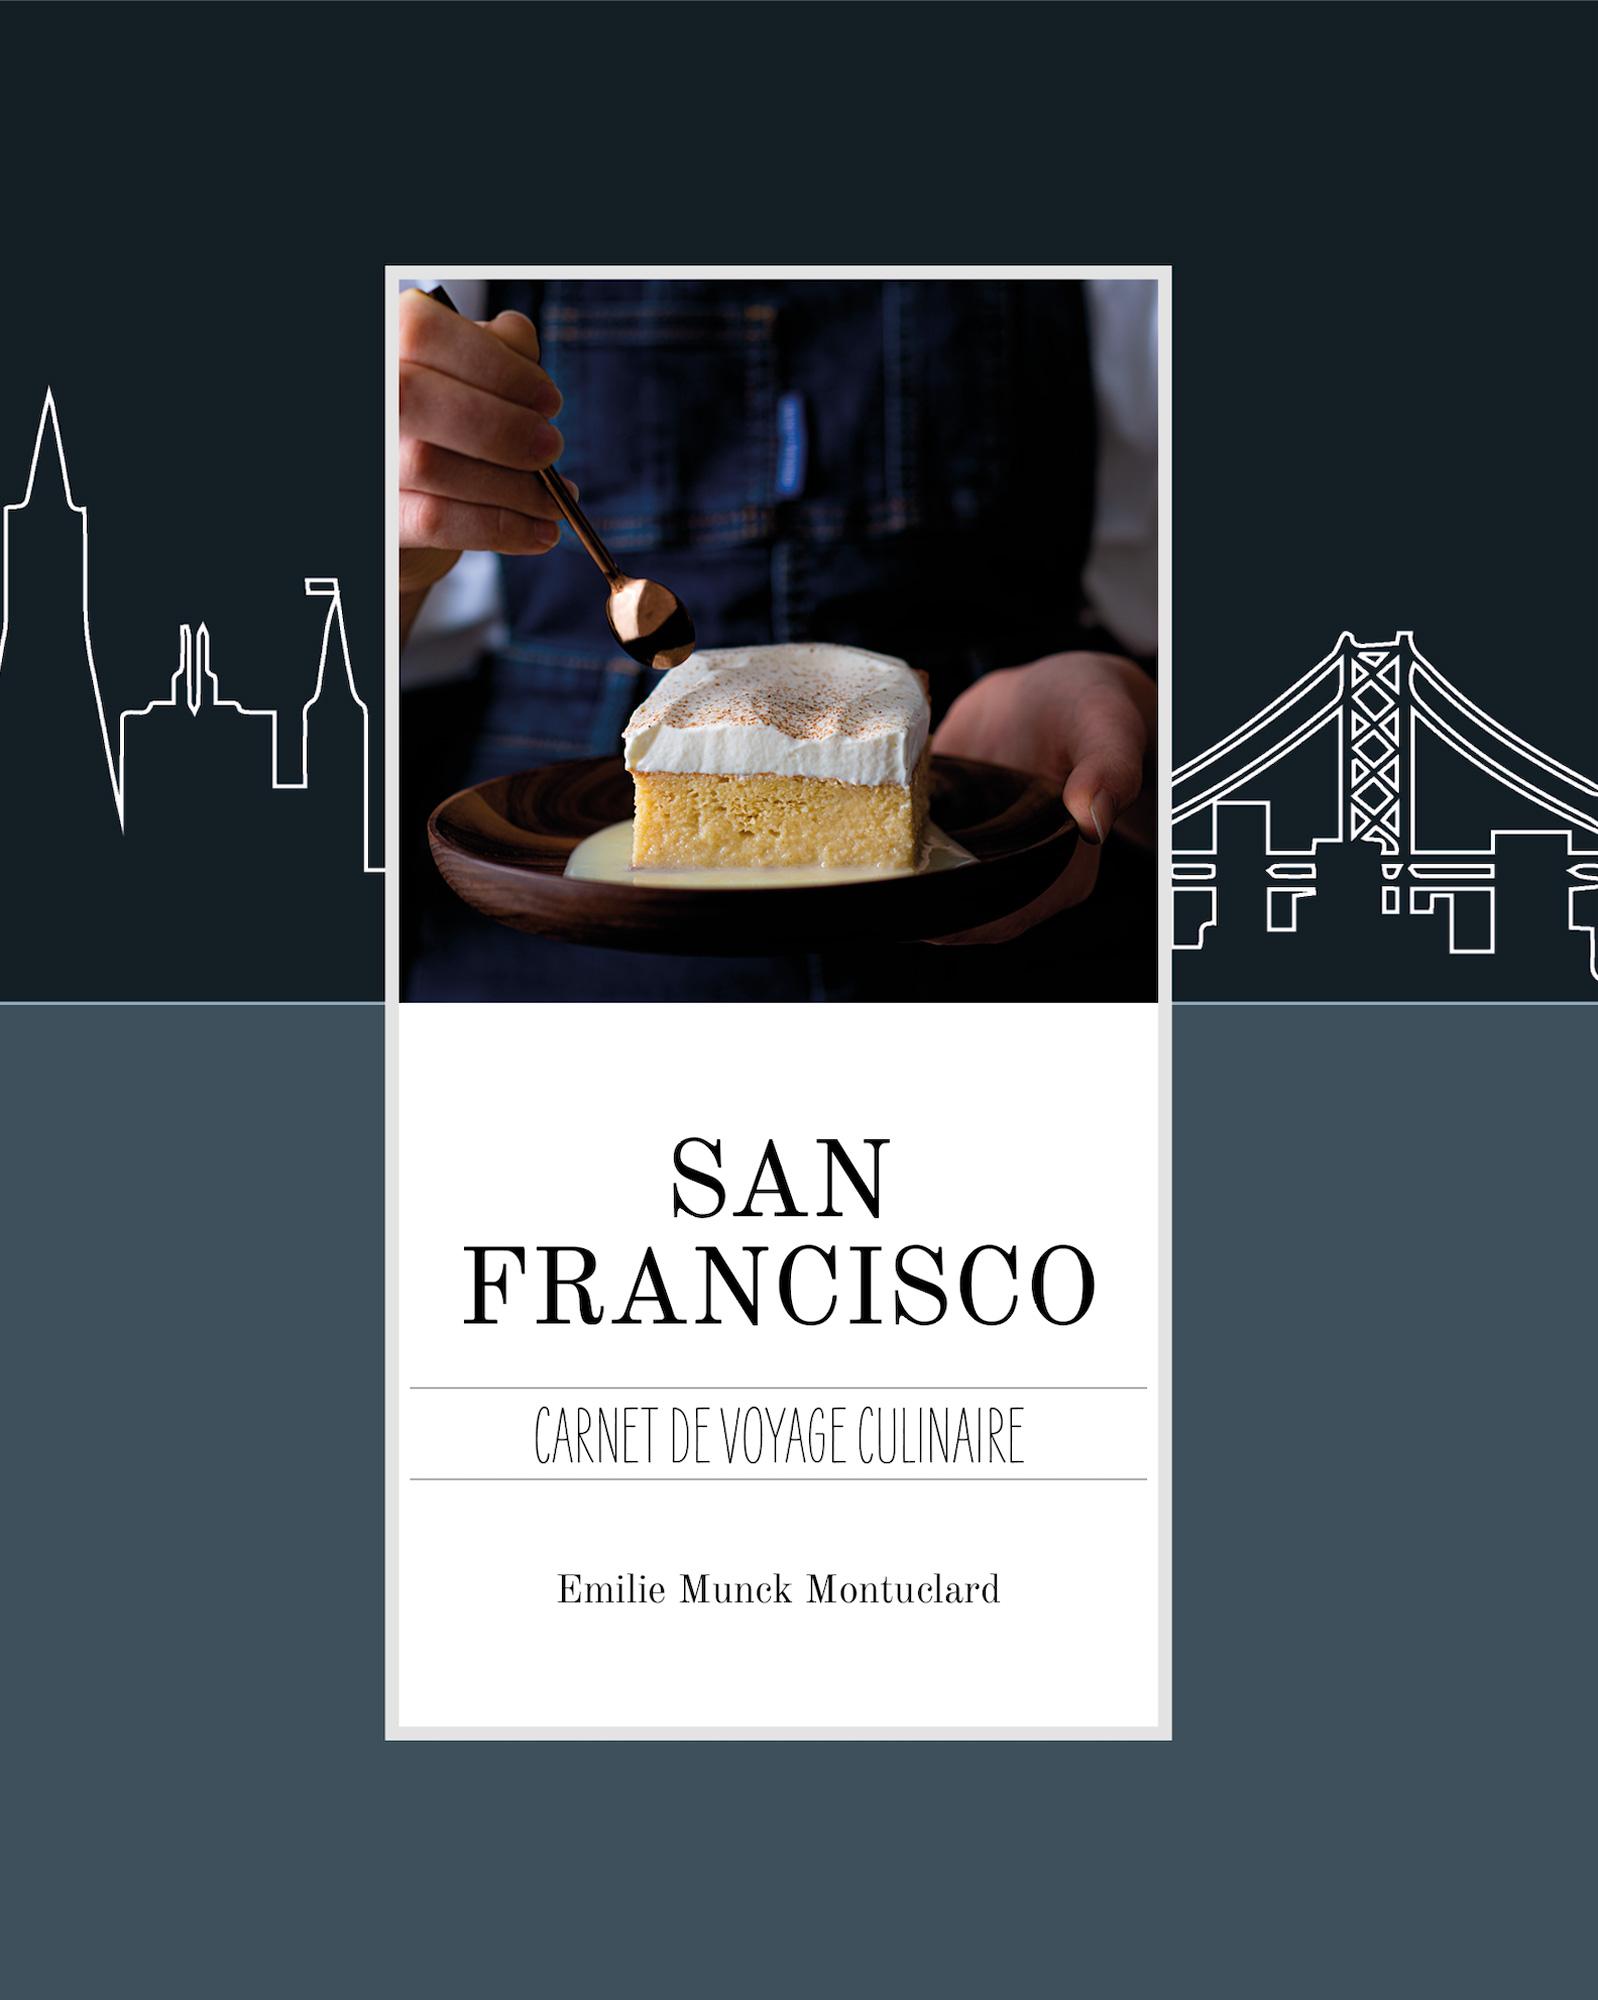 San Francisco - carnet de recettes culinaires ©